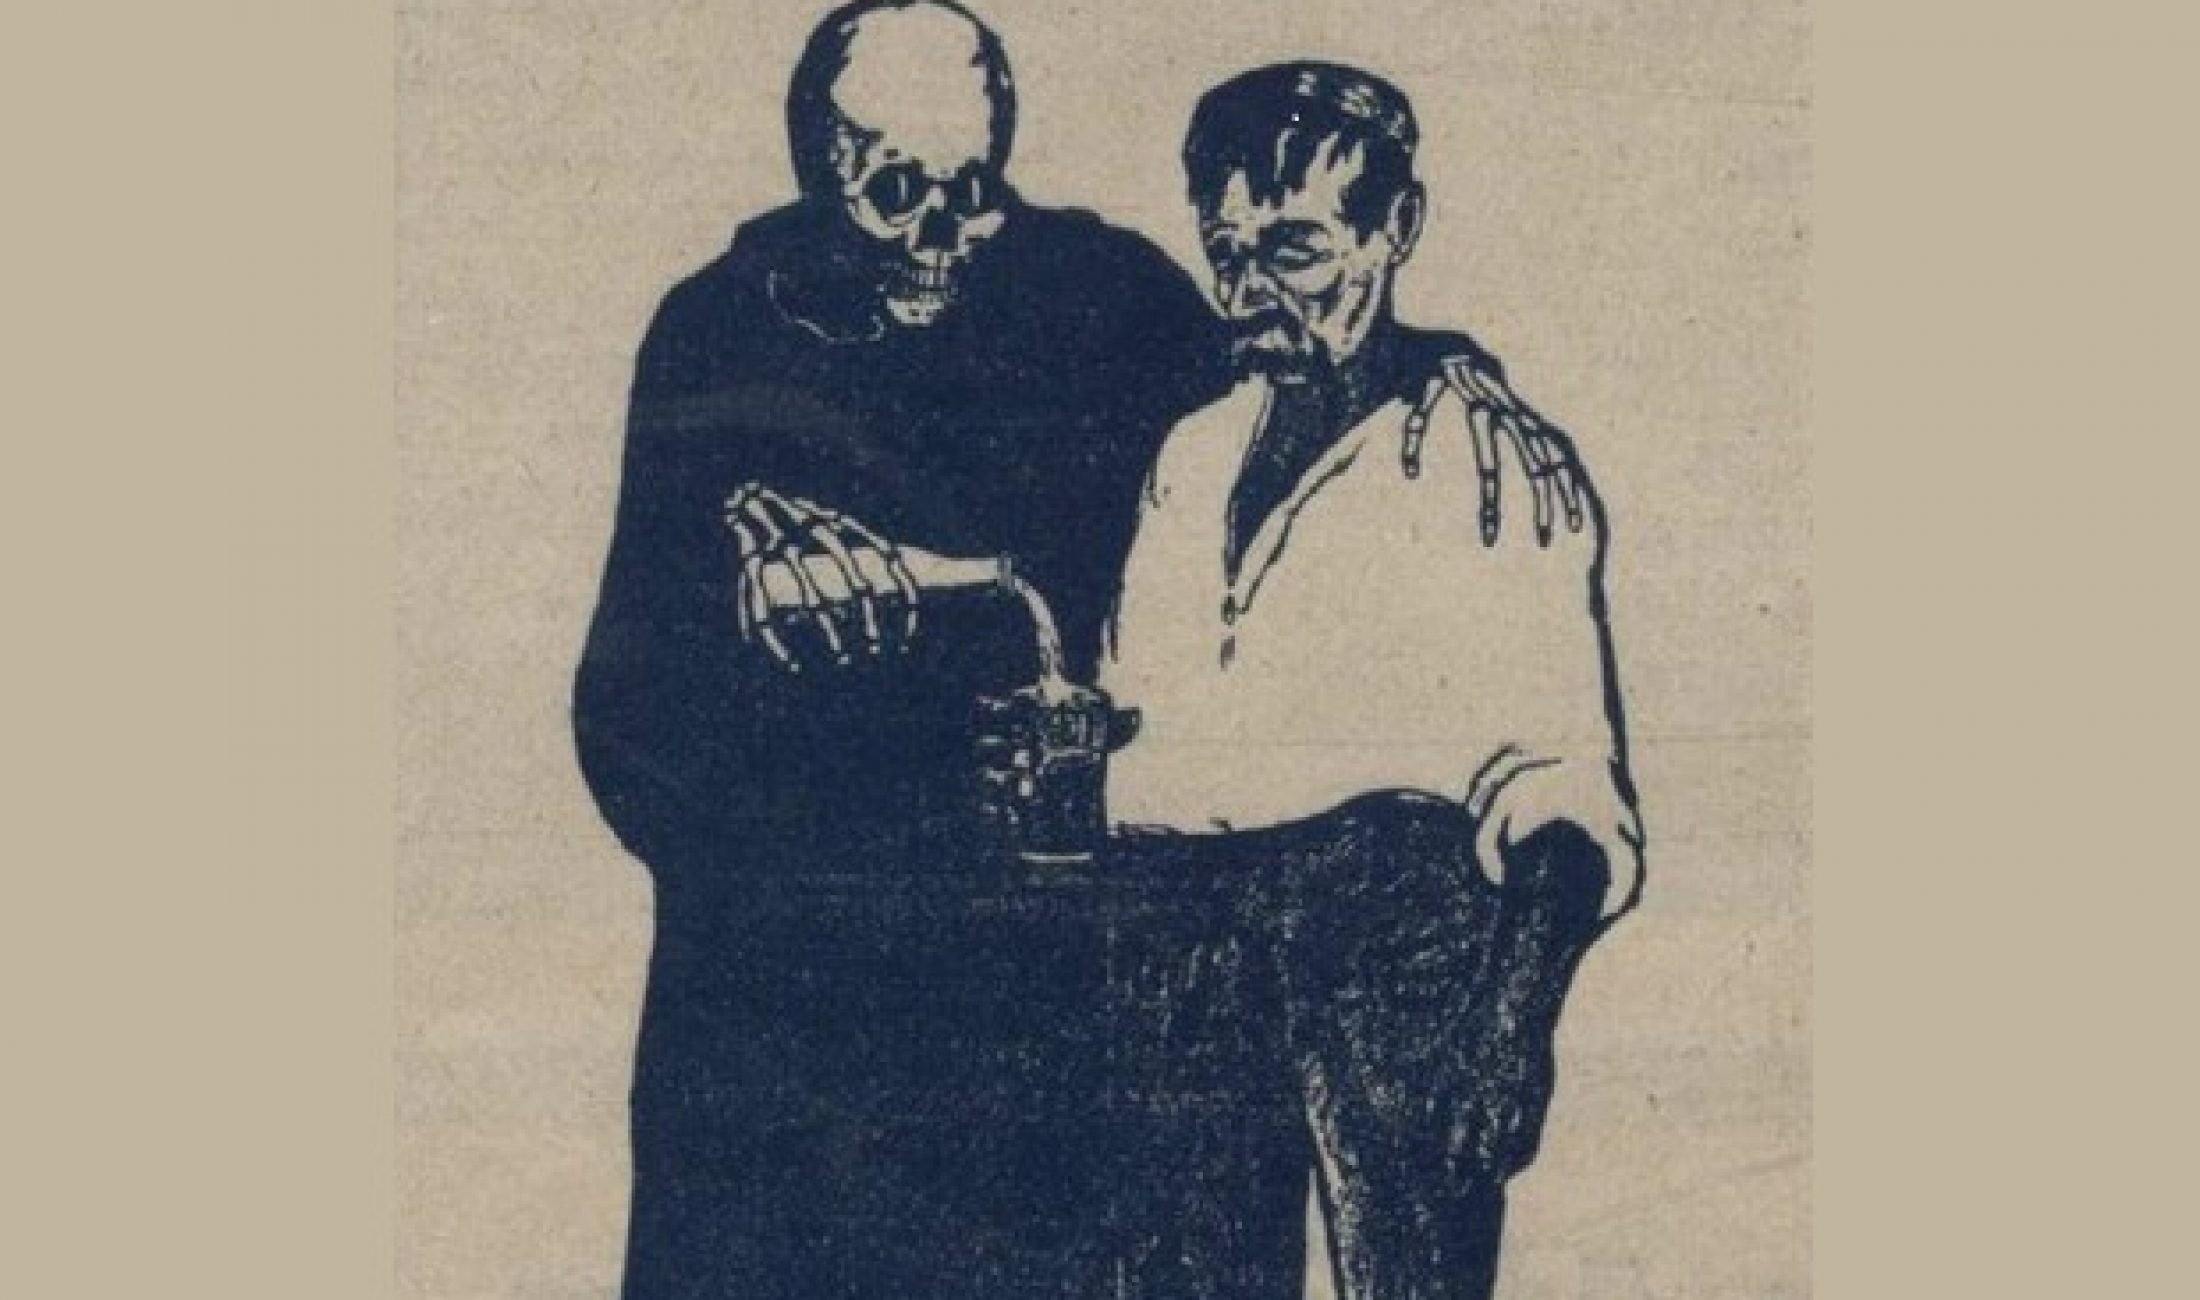 Pretalkohola kusteiba Latgolā 19. gs. vyds – 1940. gods